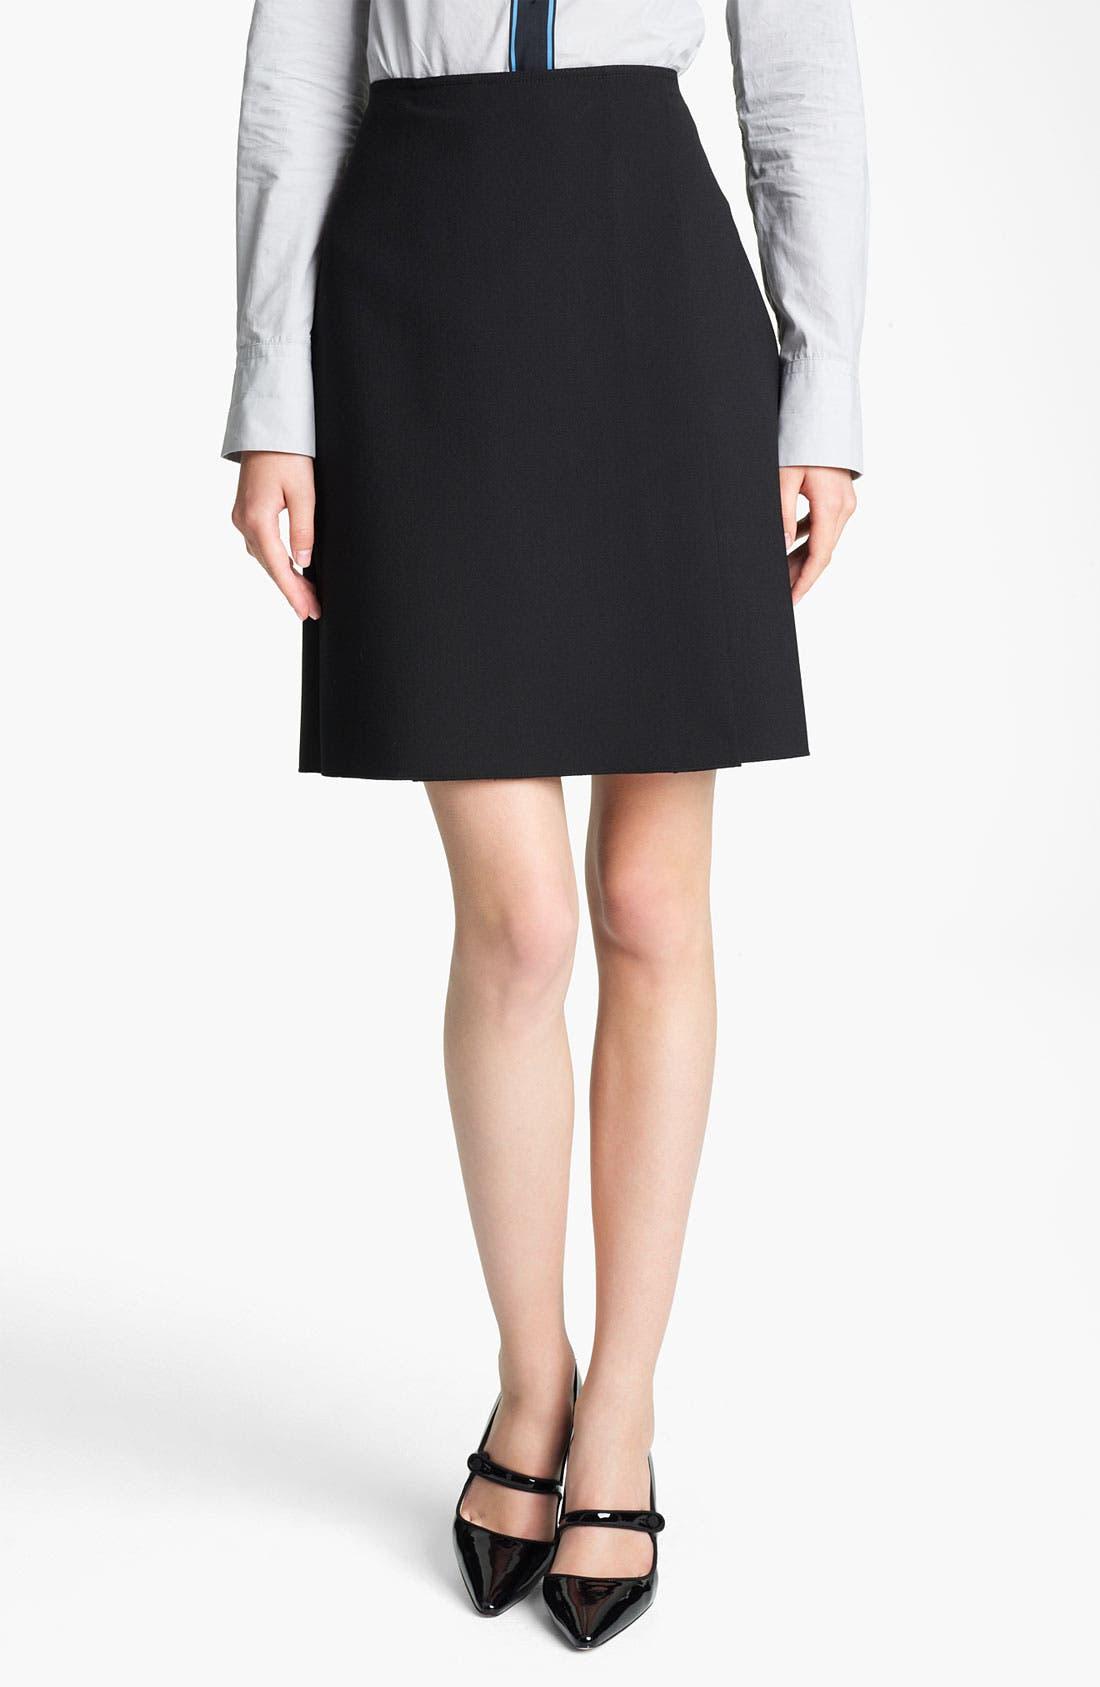 Alternate Image 1 Selected - Jil Sander Navy Pleat Stretch Wool Blend Skirt